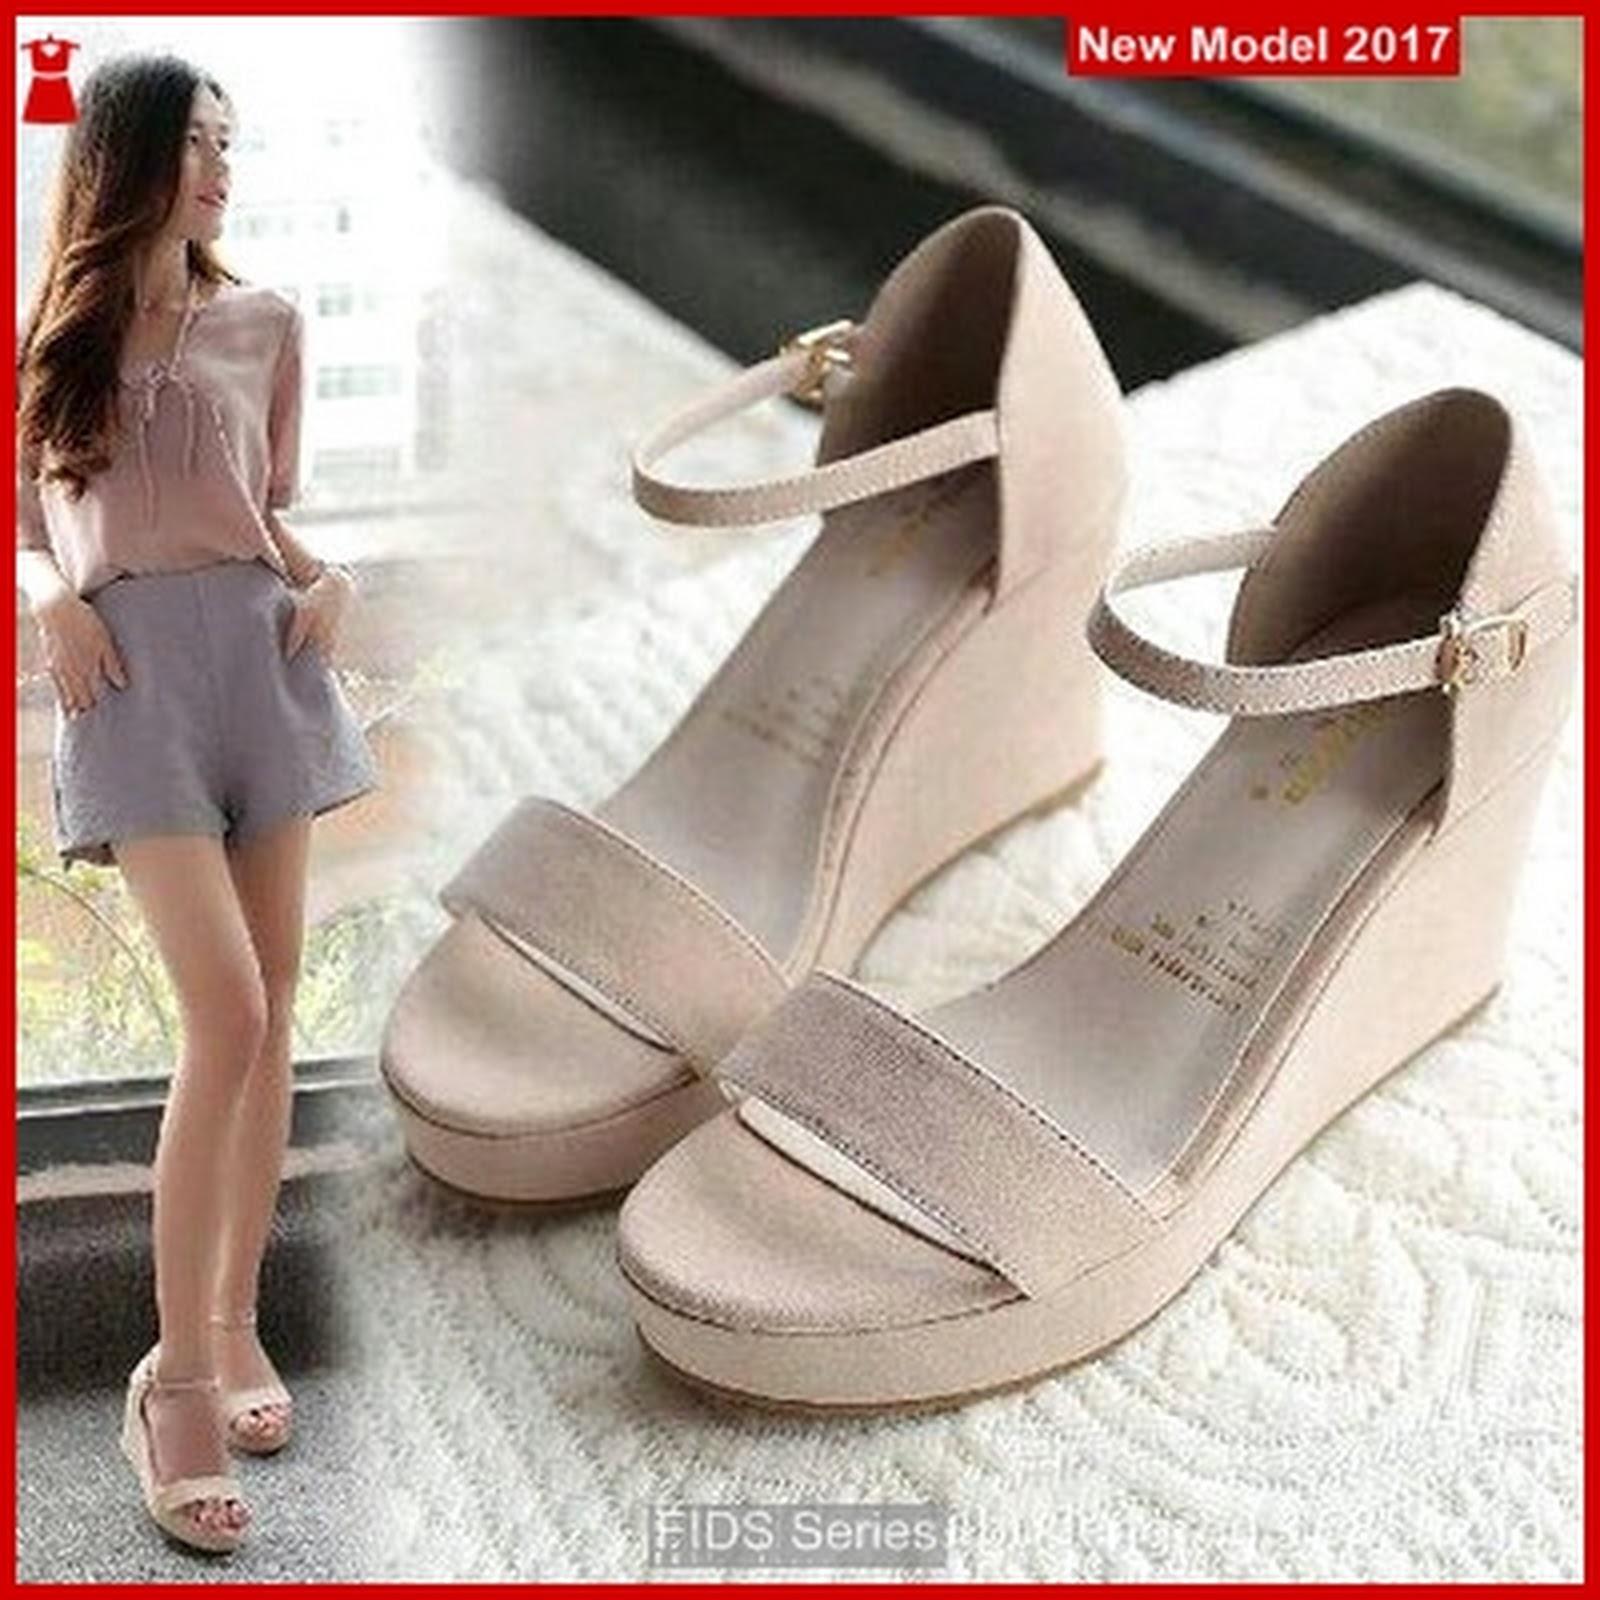 FIDS041 Sepatu Wanita Sandal Wedges Donatello BMG 998e6eca75